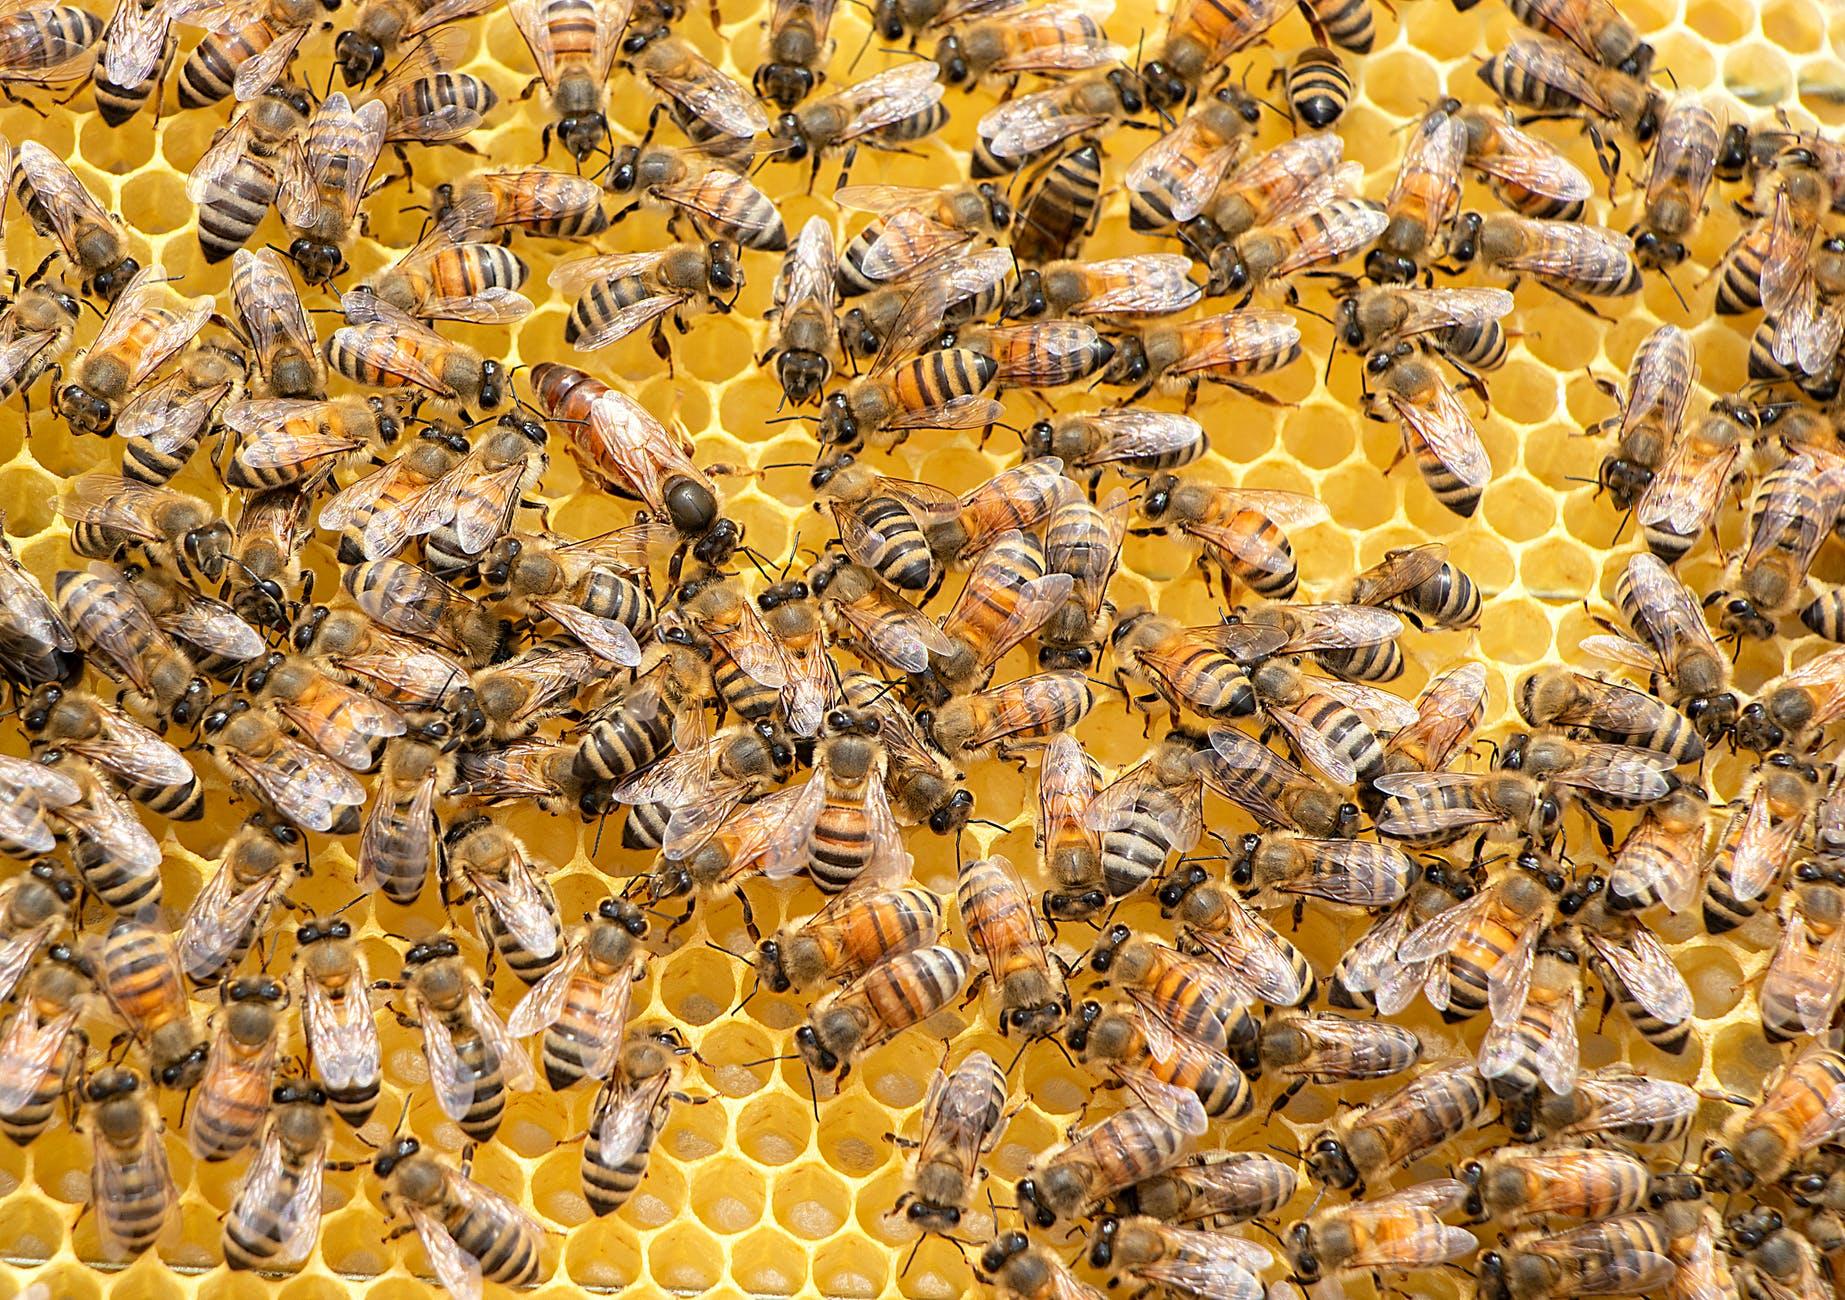 méhhotel